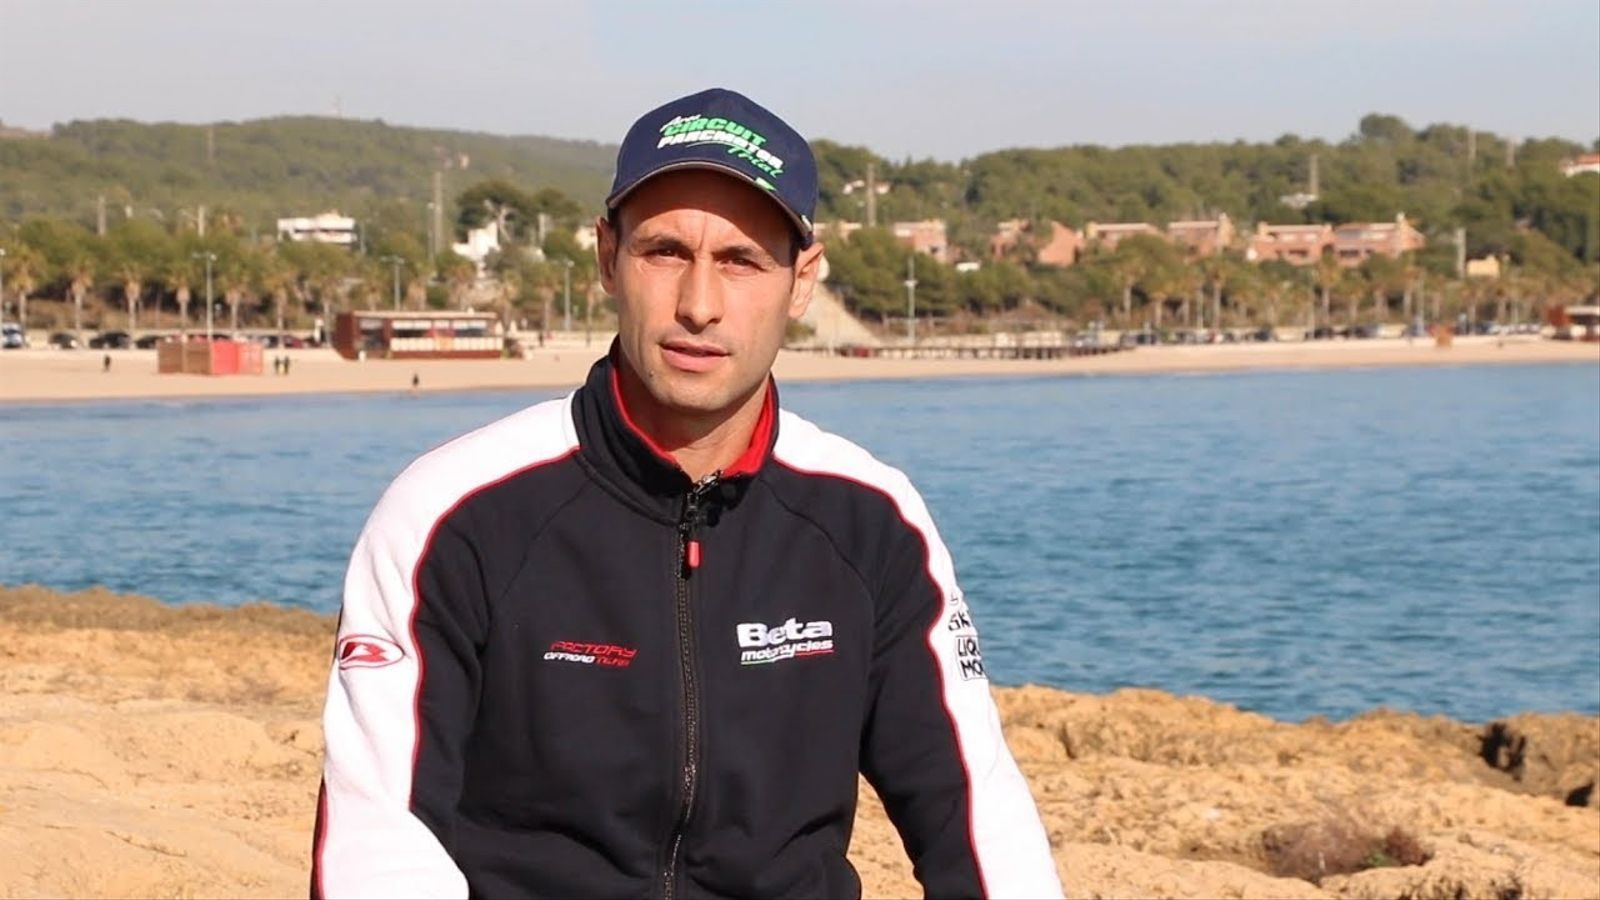 Albert Cabestany anuncia que es retira com a pilot professional de trial